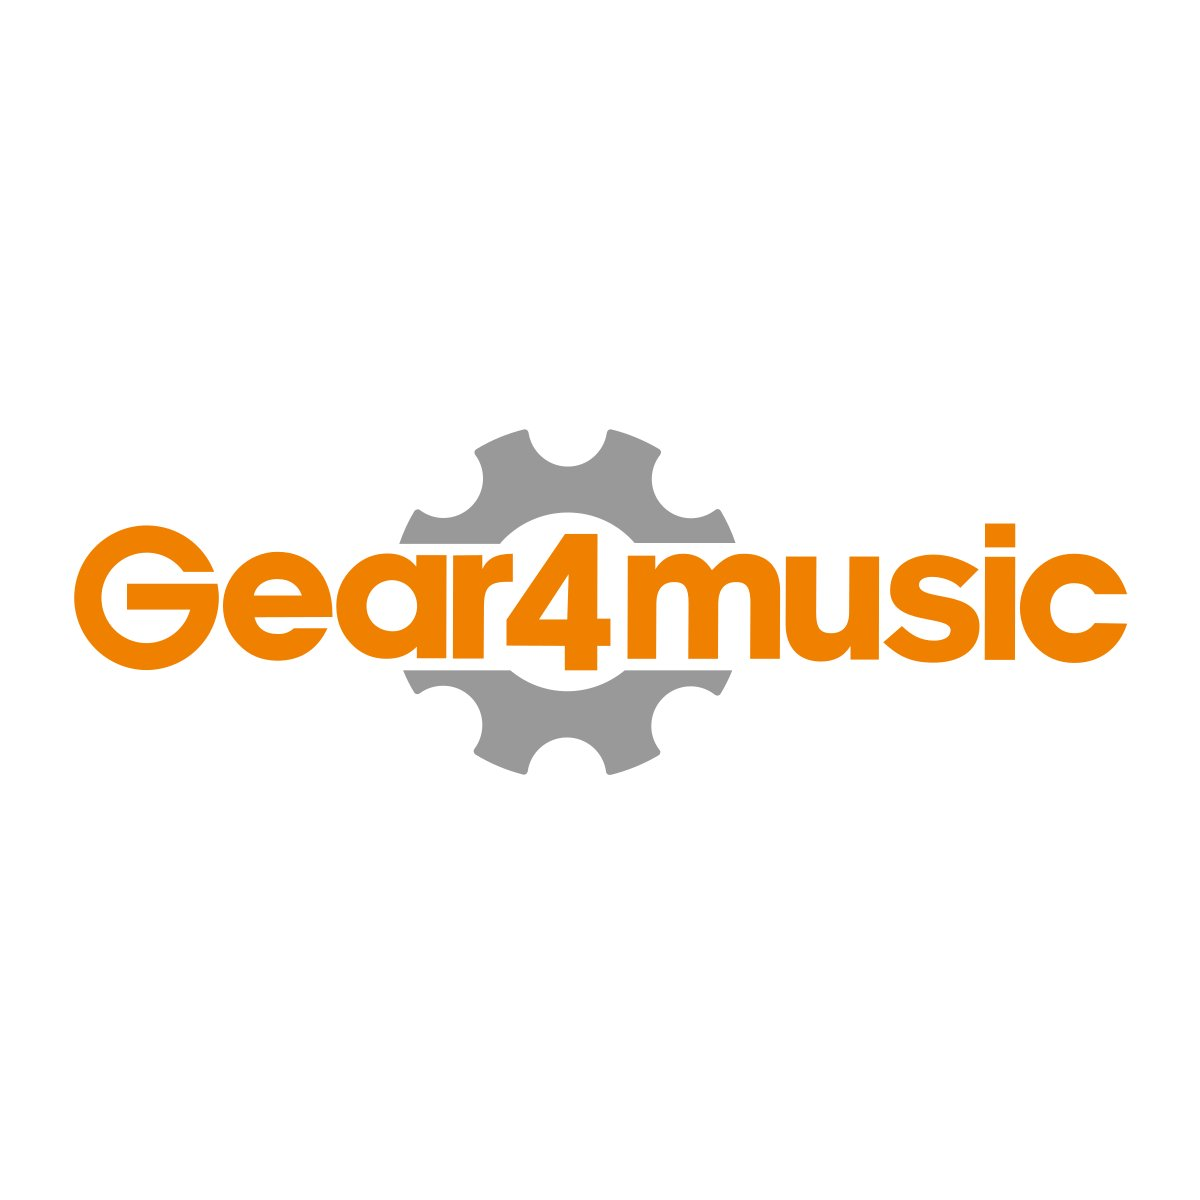 evans hybrid s black marching snare drum head 14 inch at gear4music. Black Bedroom Furniture Sets. Home Design Ideas